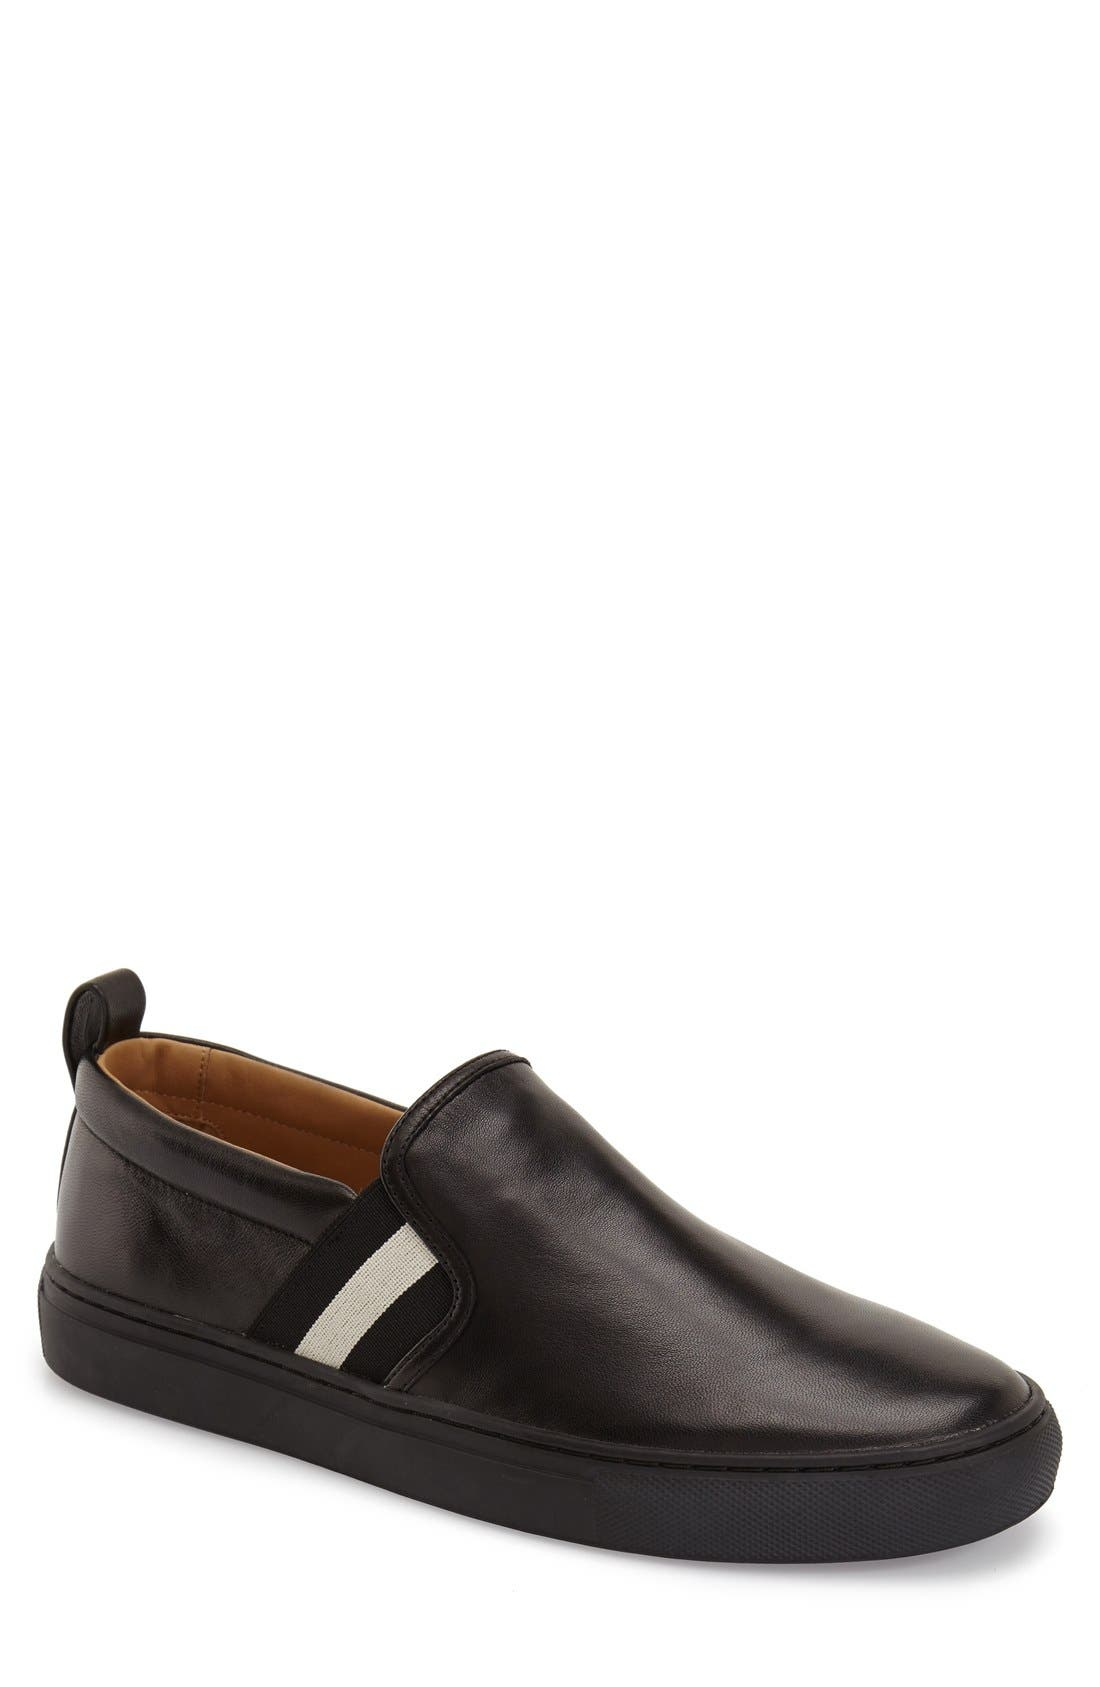 'Herald' Slip-On,                         Main,                         color, Black Leather